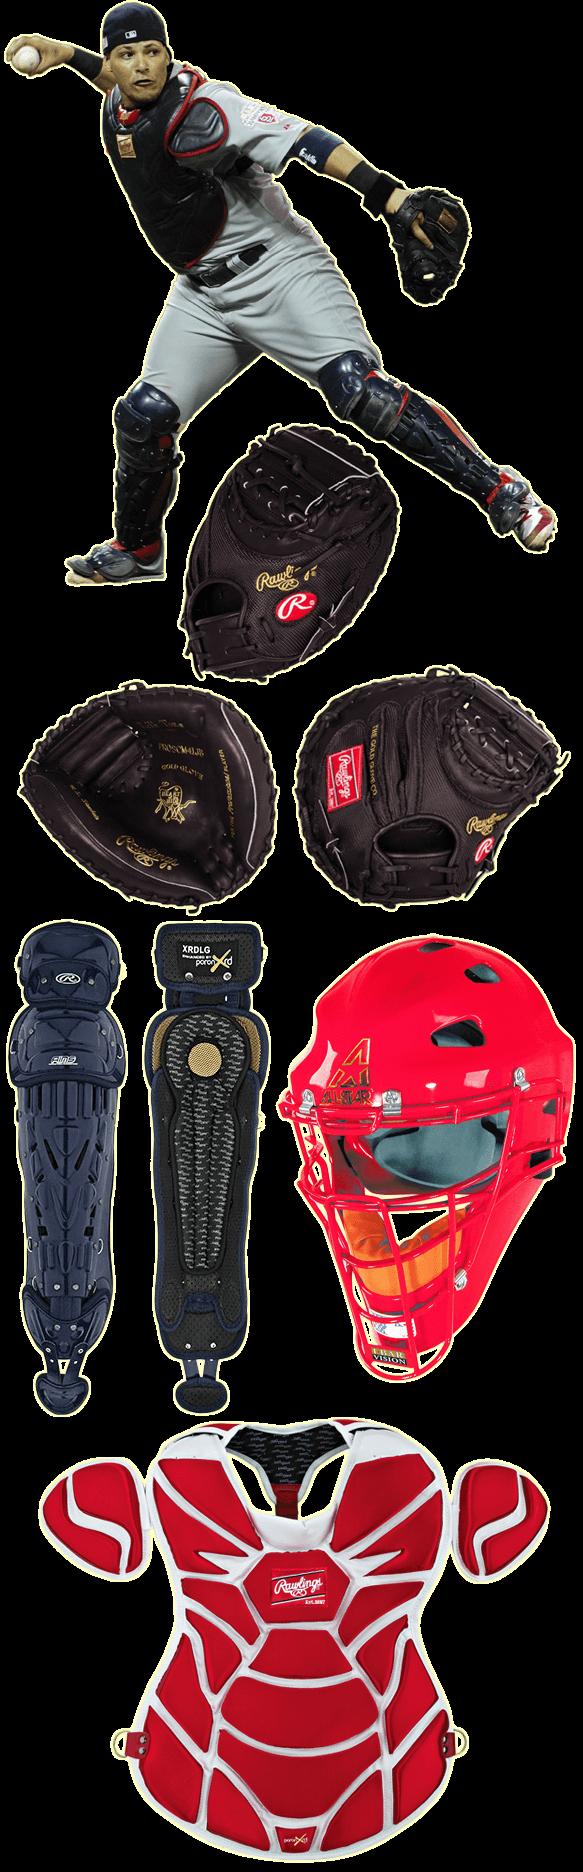 yadier molina mask, yadier molina catcher gear, yadier molina chest protector, yadier molina glove, PROSCM41